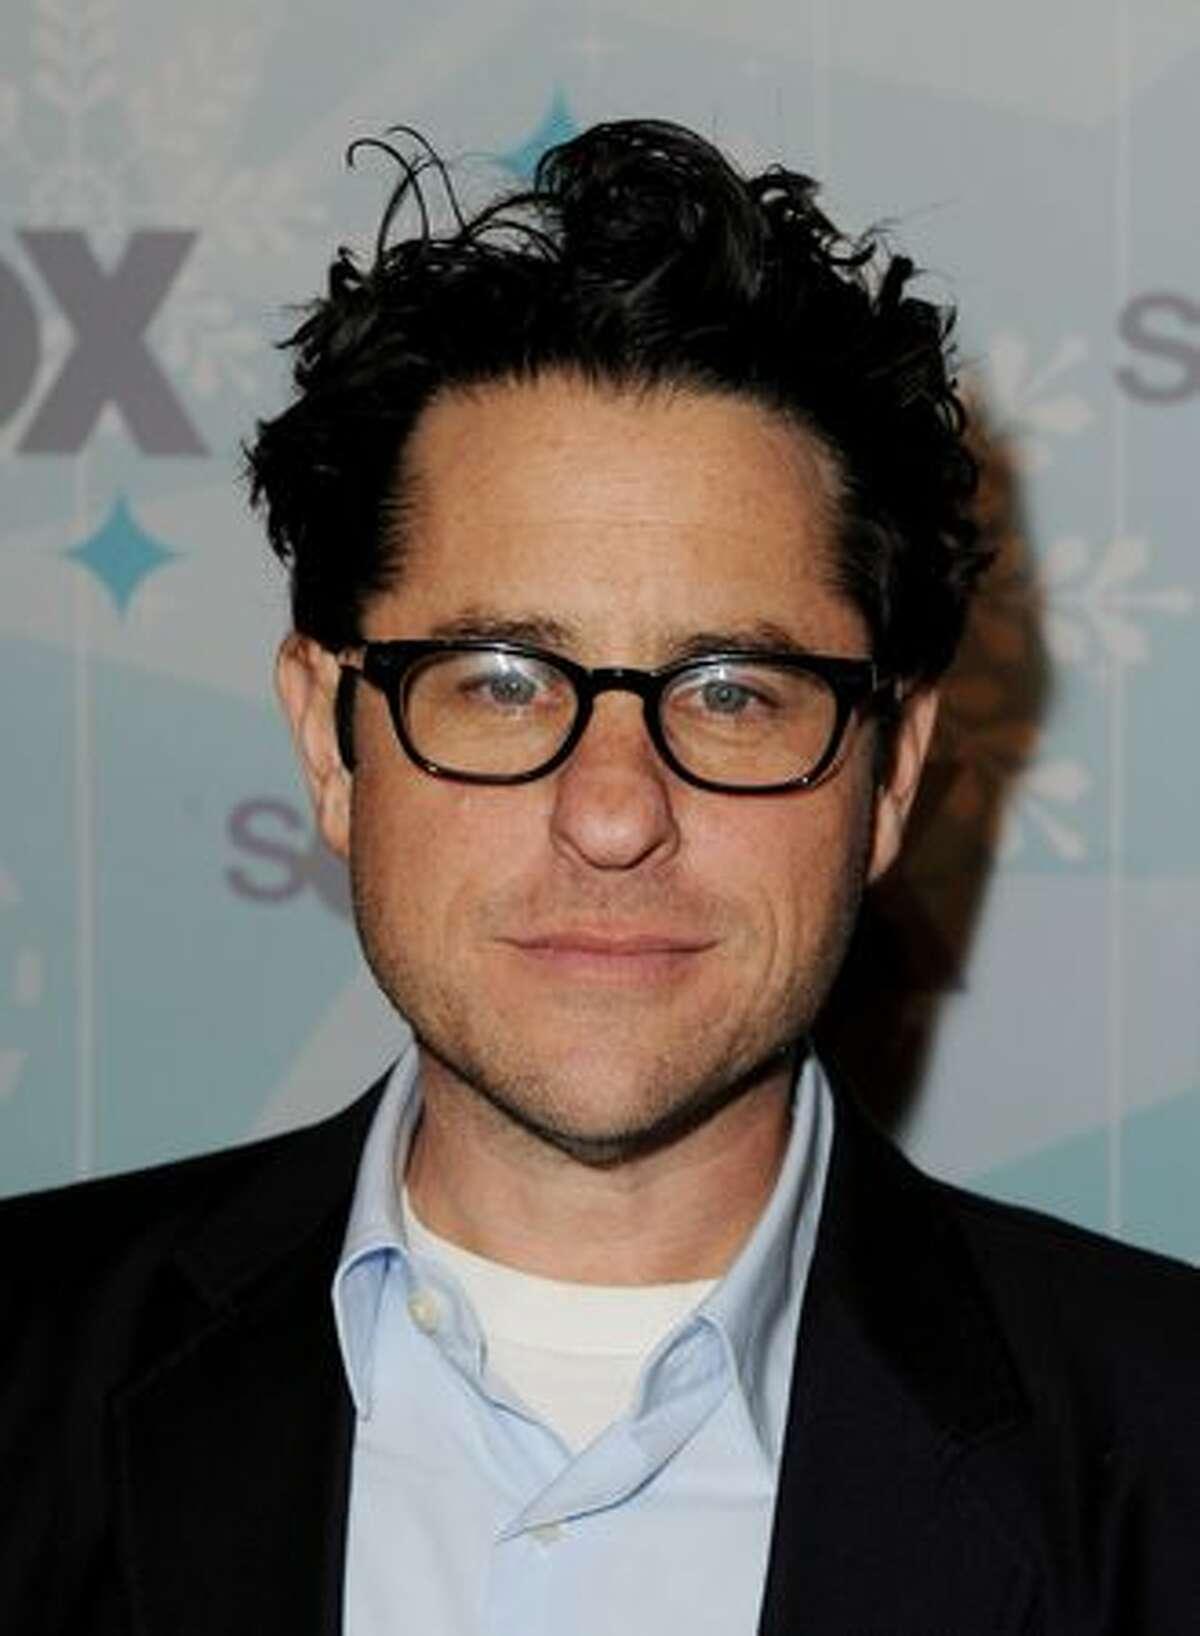 Producer J.J. Abrams arrives at Fox TV's TCA All-Star Party at Villa Sorriso in Pasadena, California.